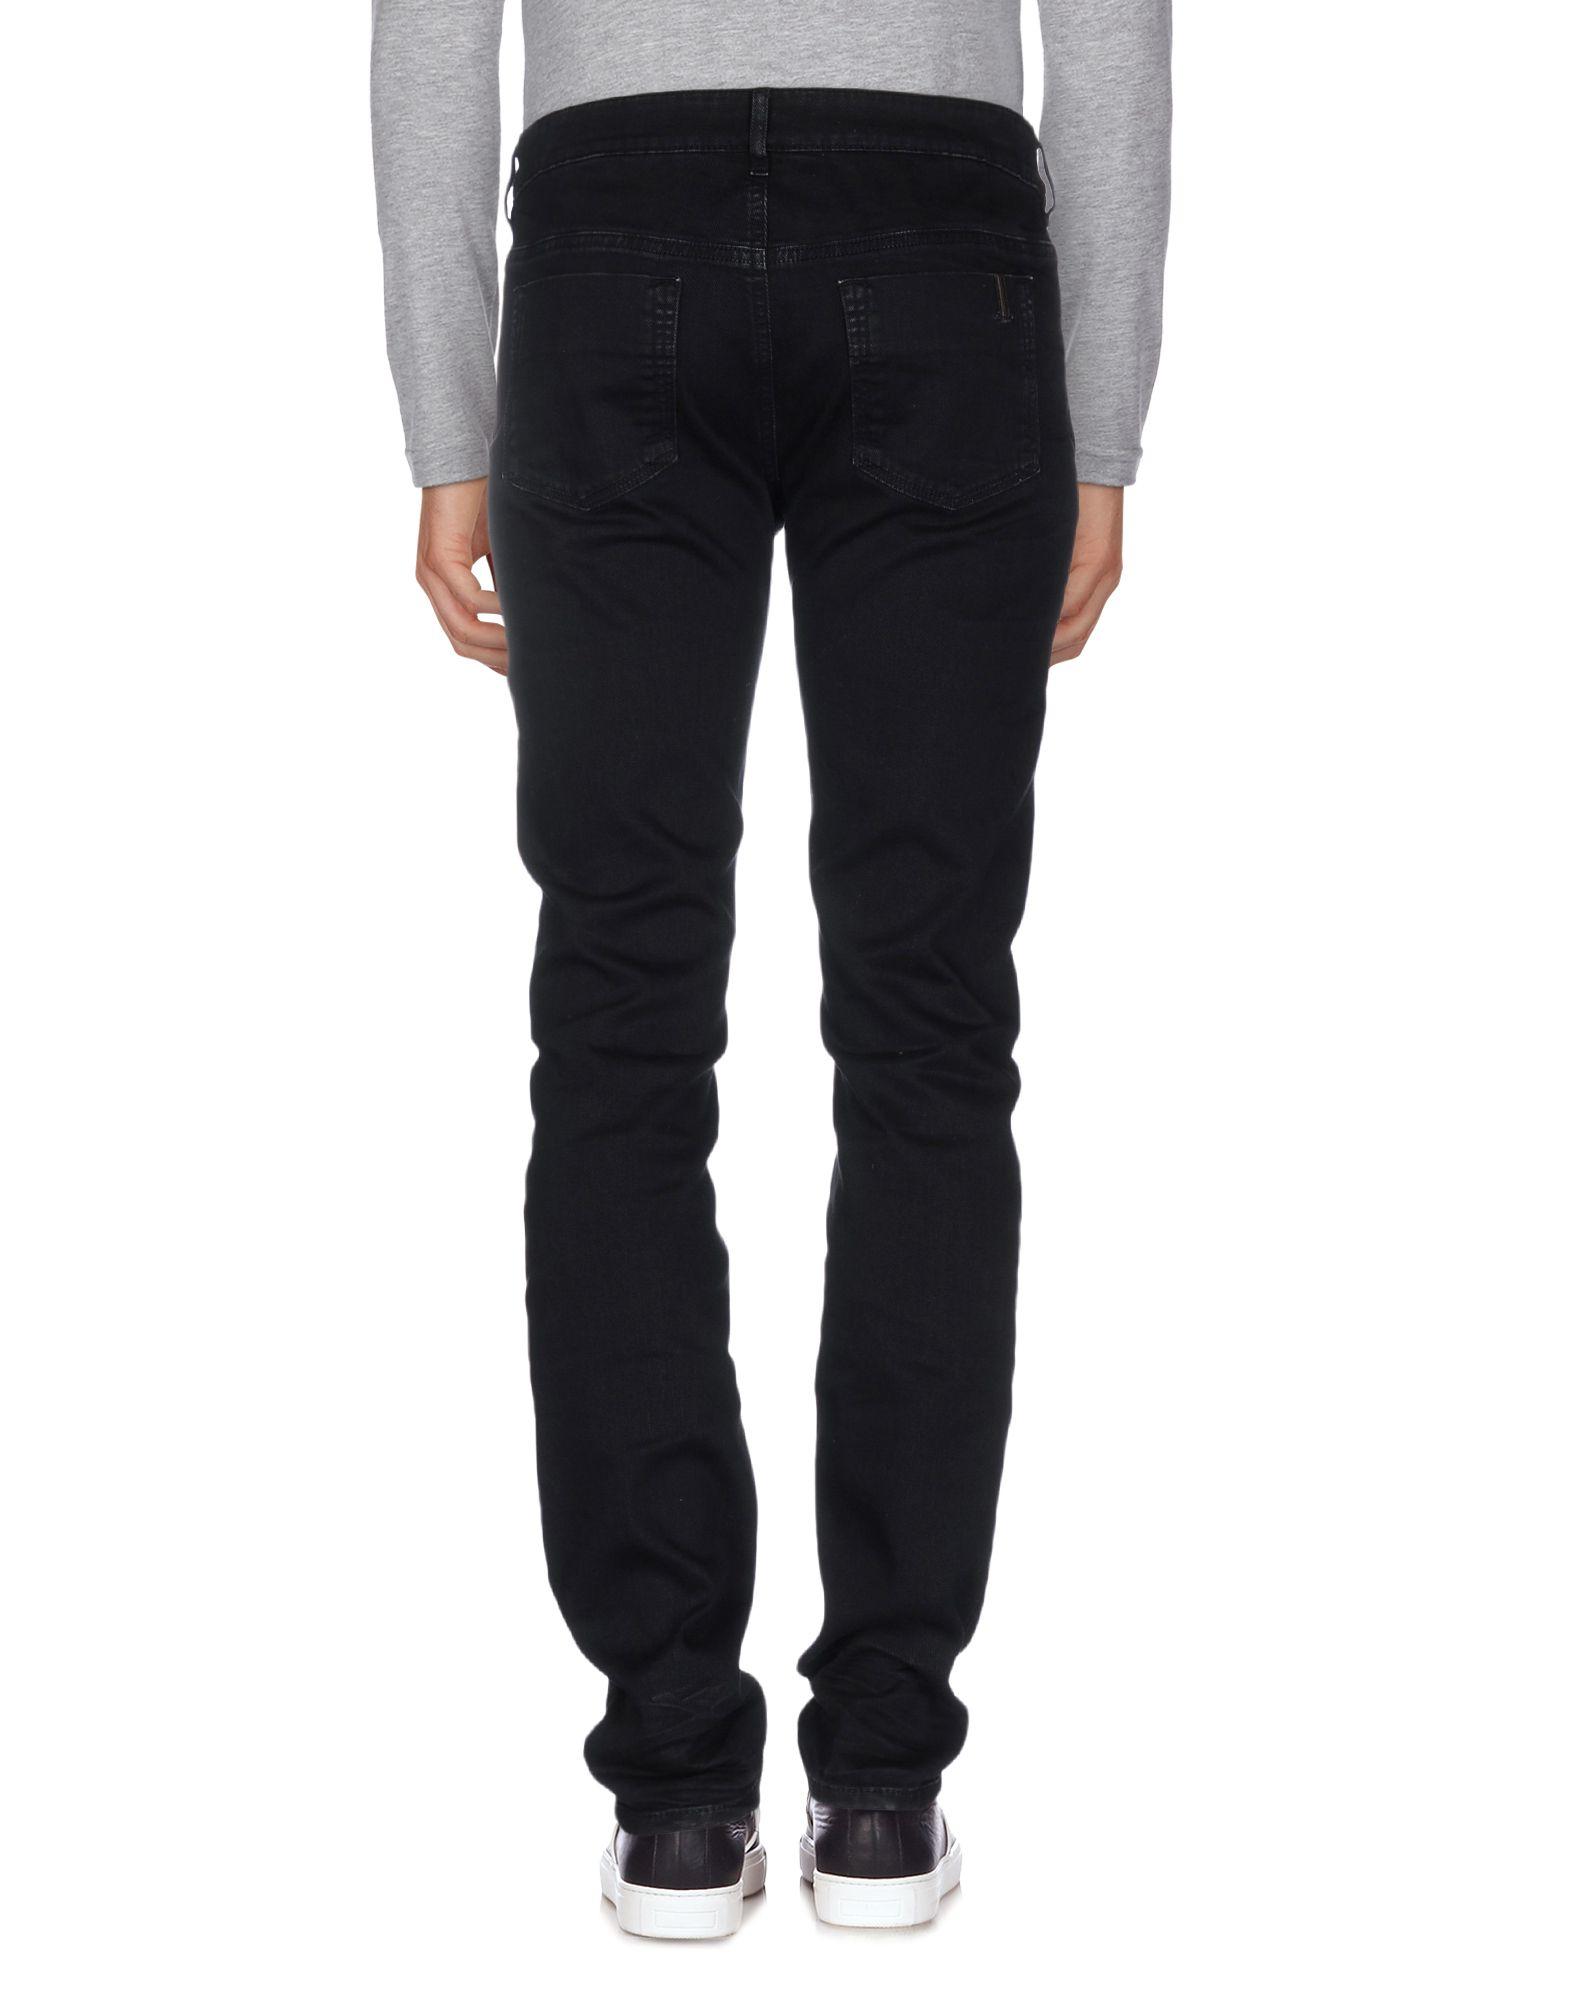 Notify Denim Pants in Black for Men